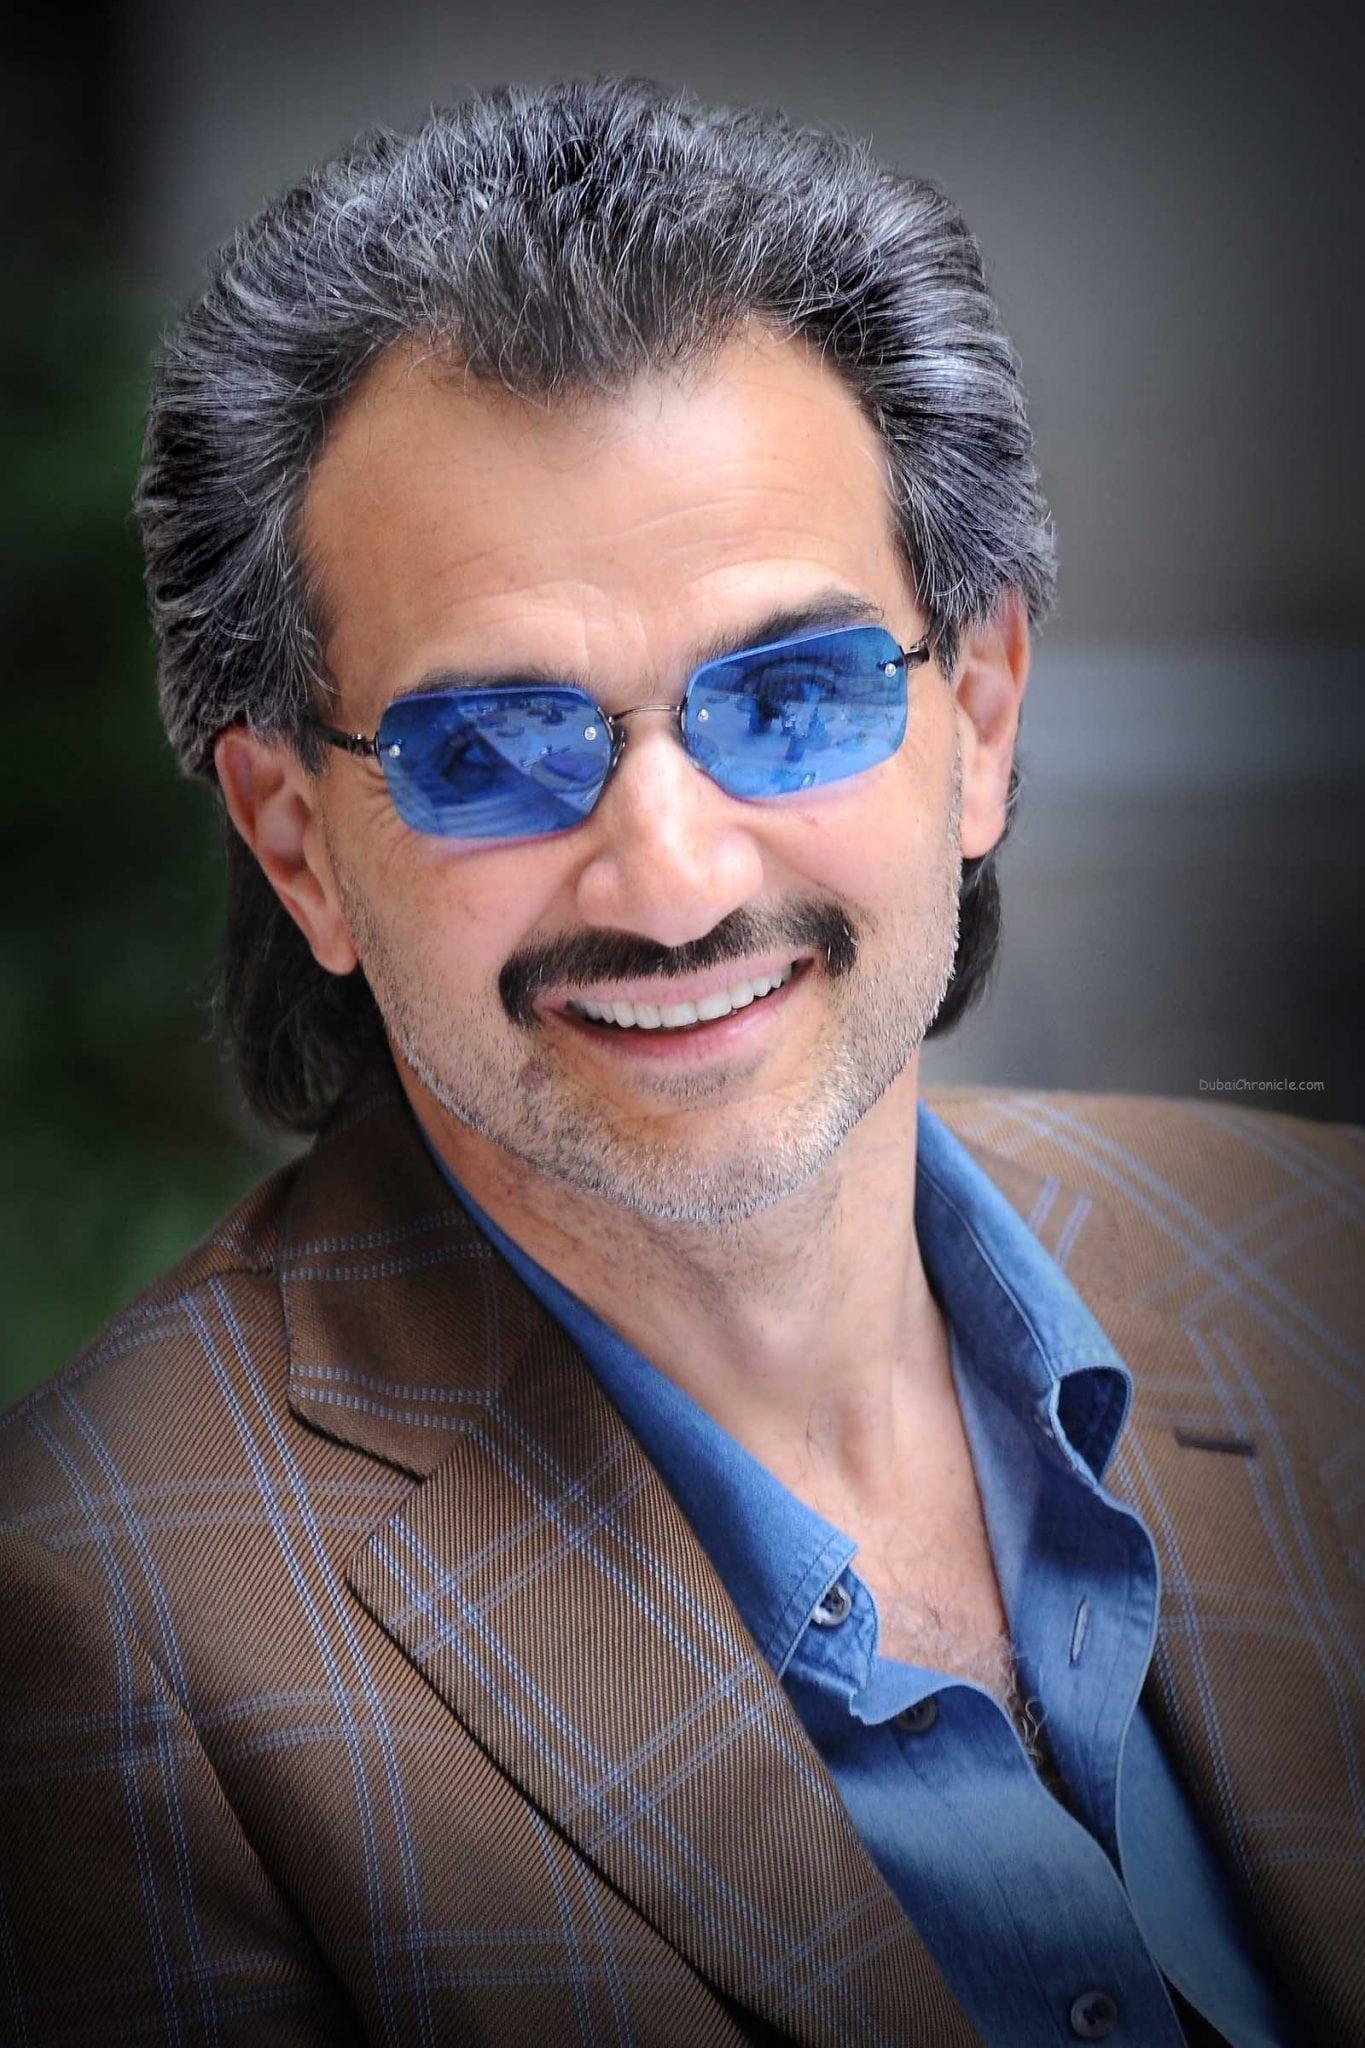 280-HRH Prince Alwaleed bin Talal, Apr 09